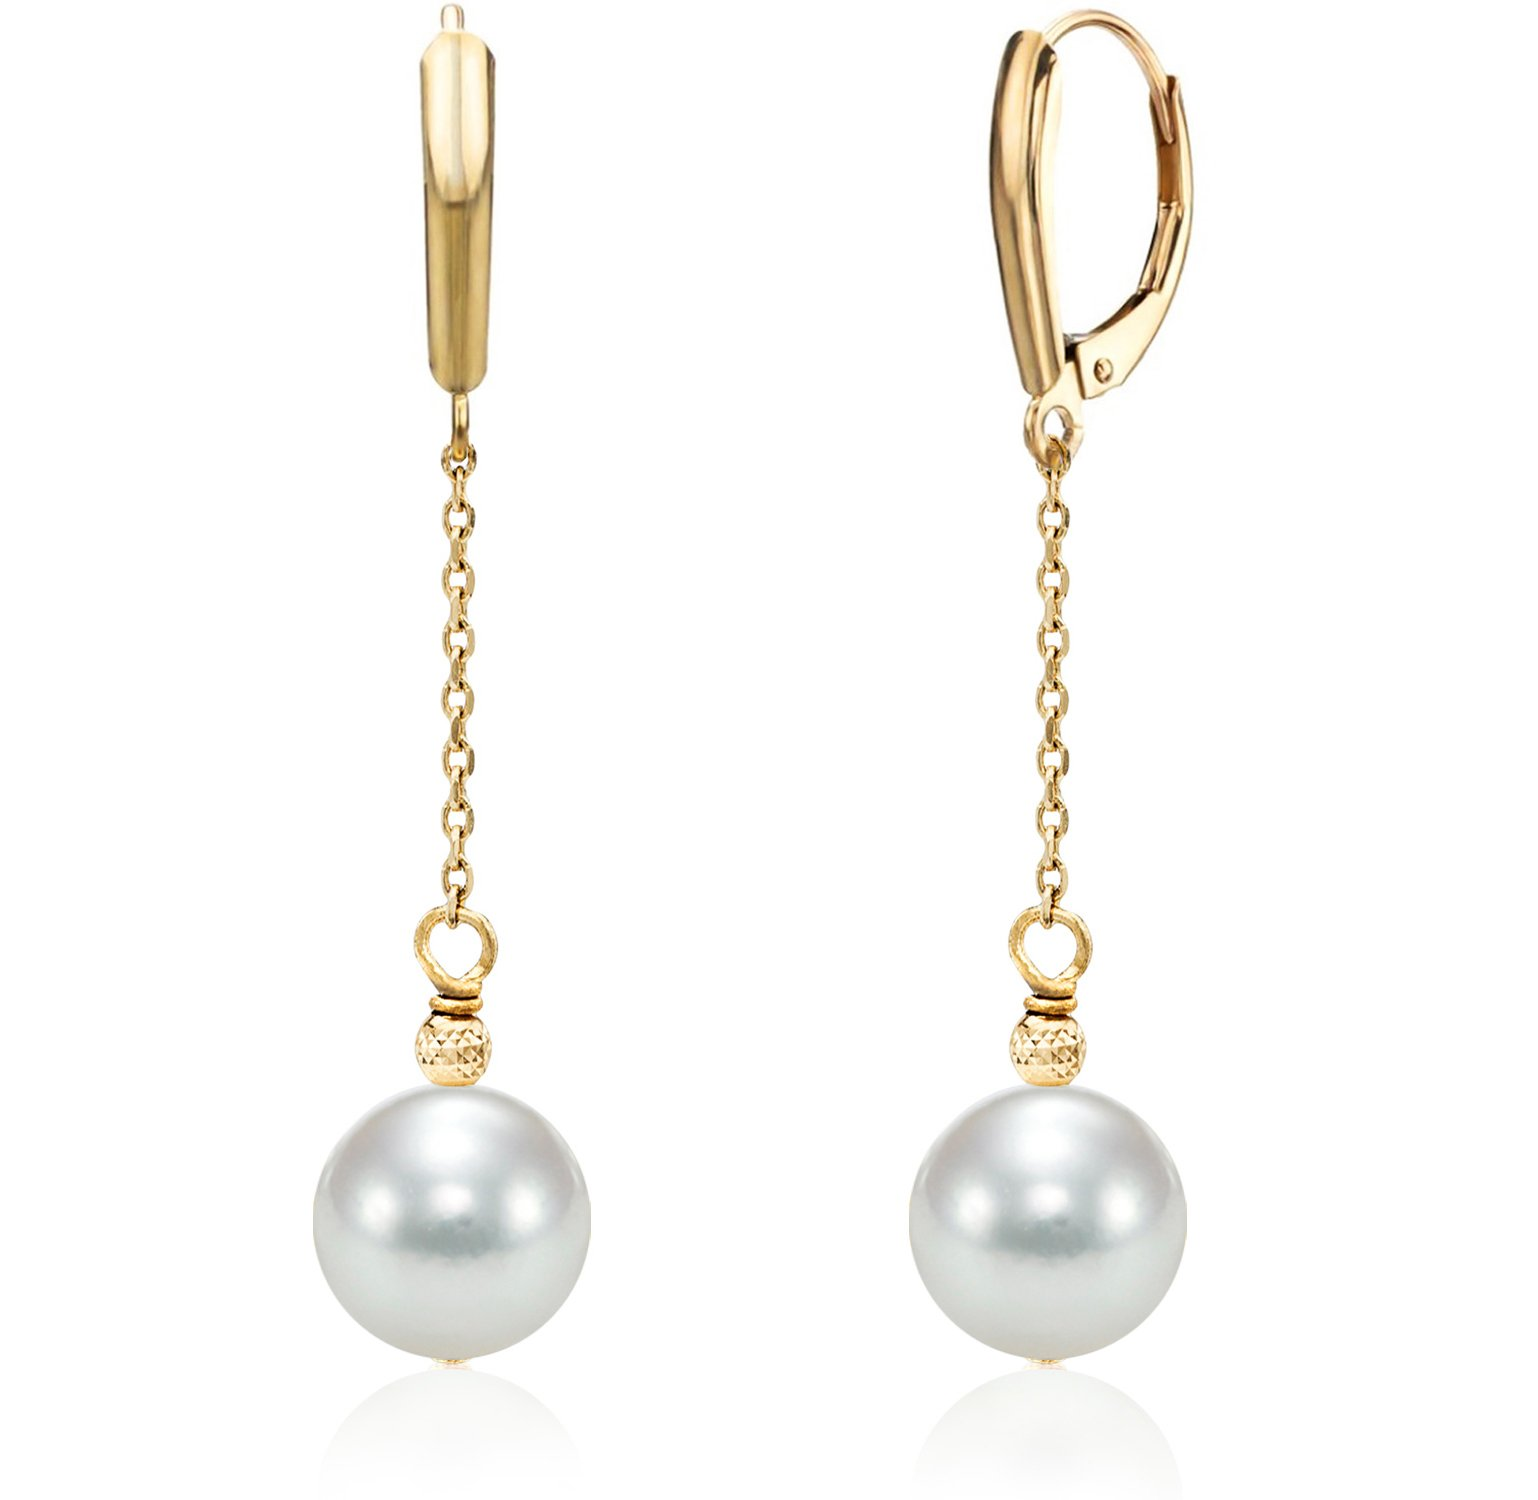 14K Yellow Gold Chain White Japanese Akoya Cultured Pearl Leverback Dangle Earrings 8-8.5mm